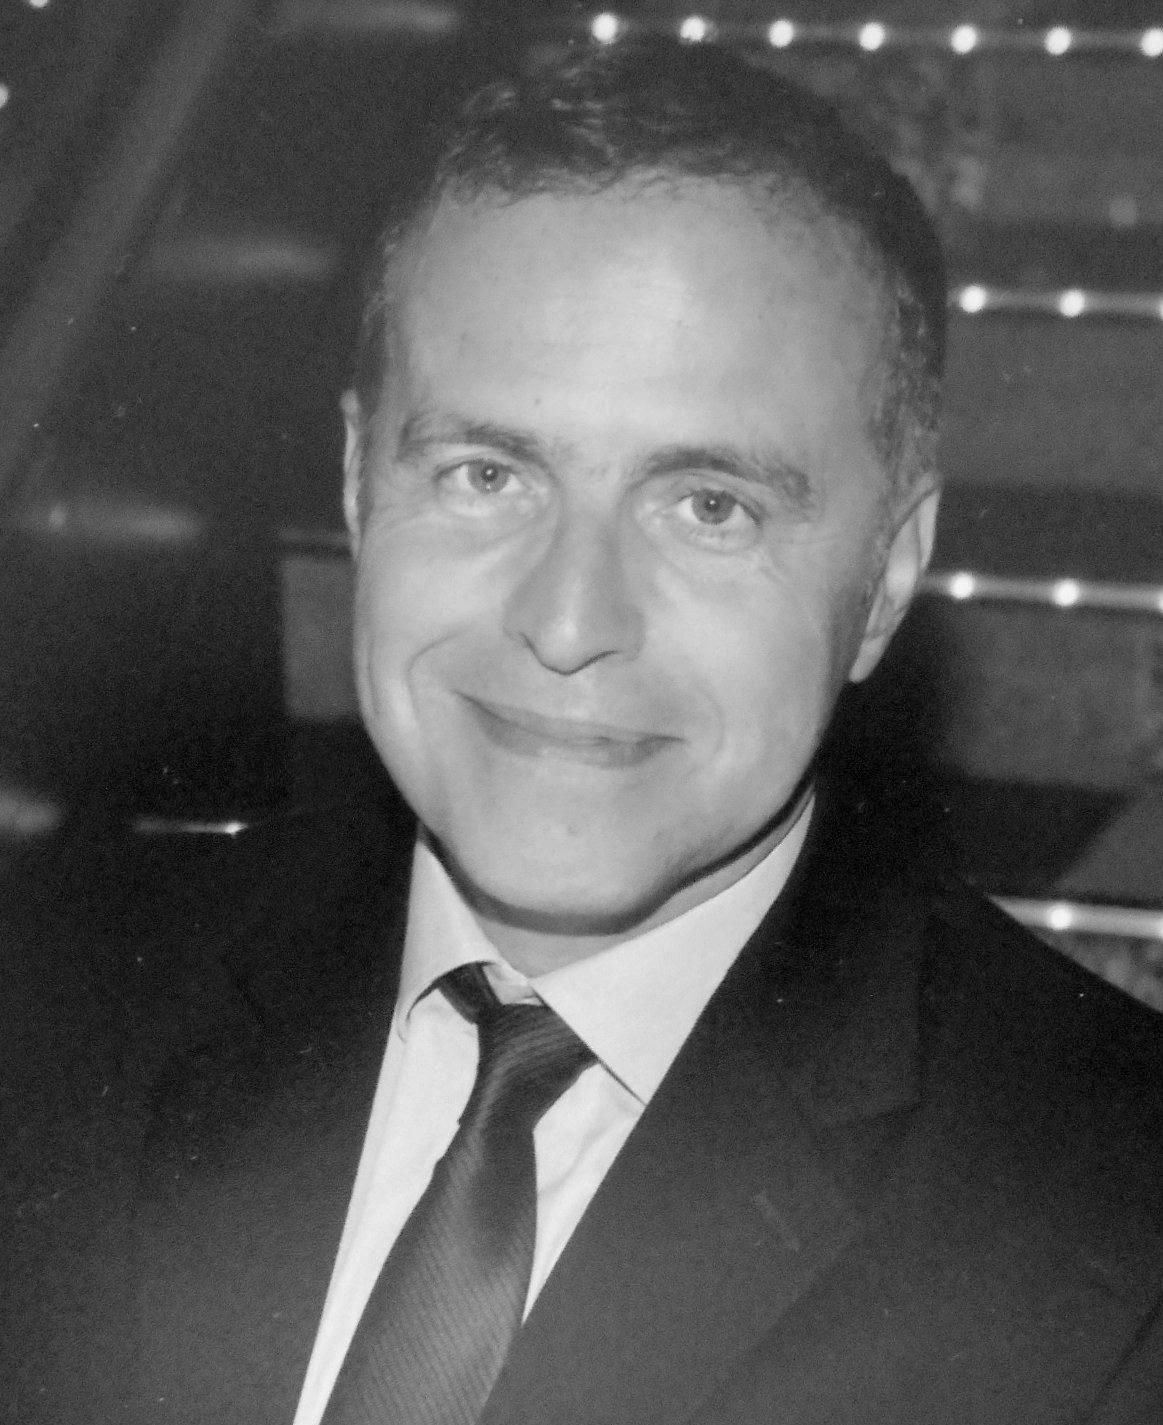 MÁRCIO WEILER